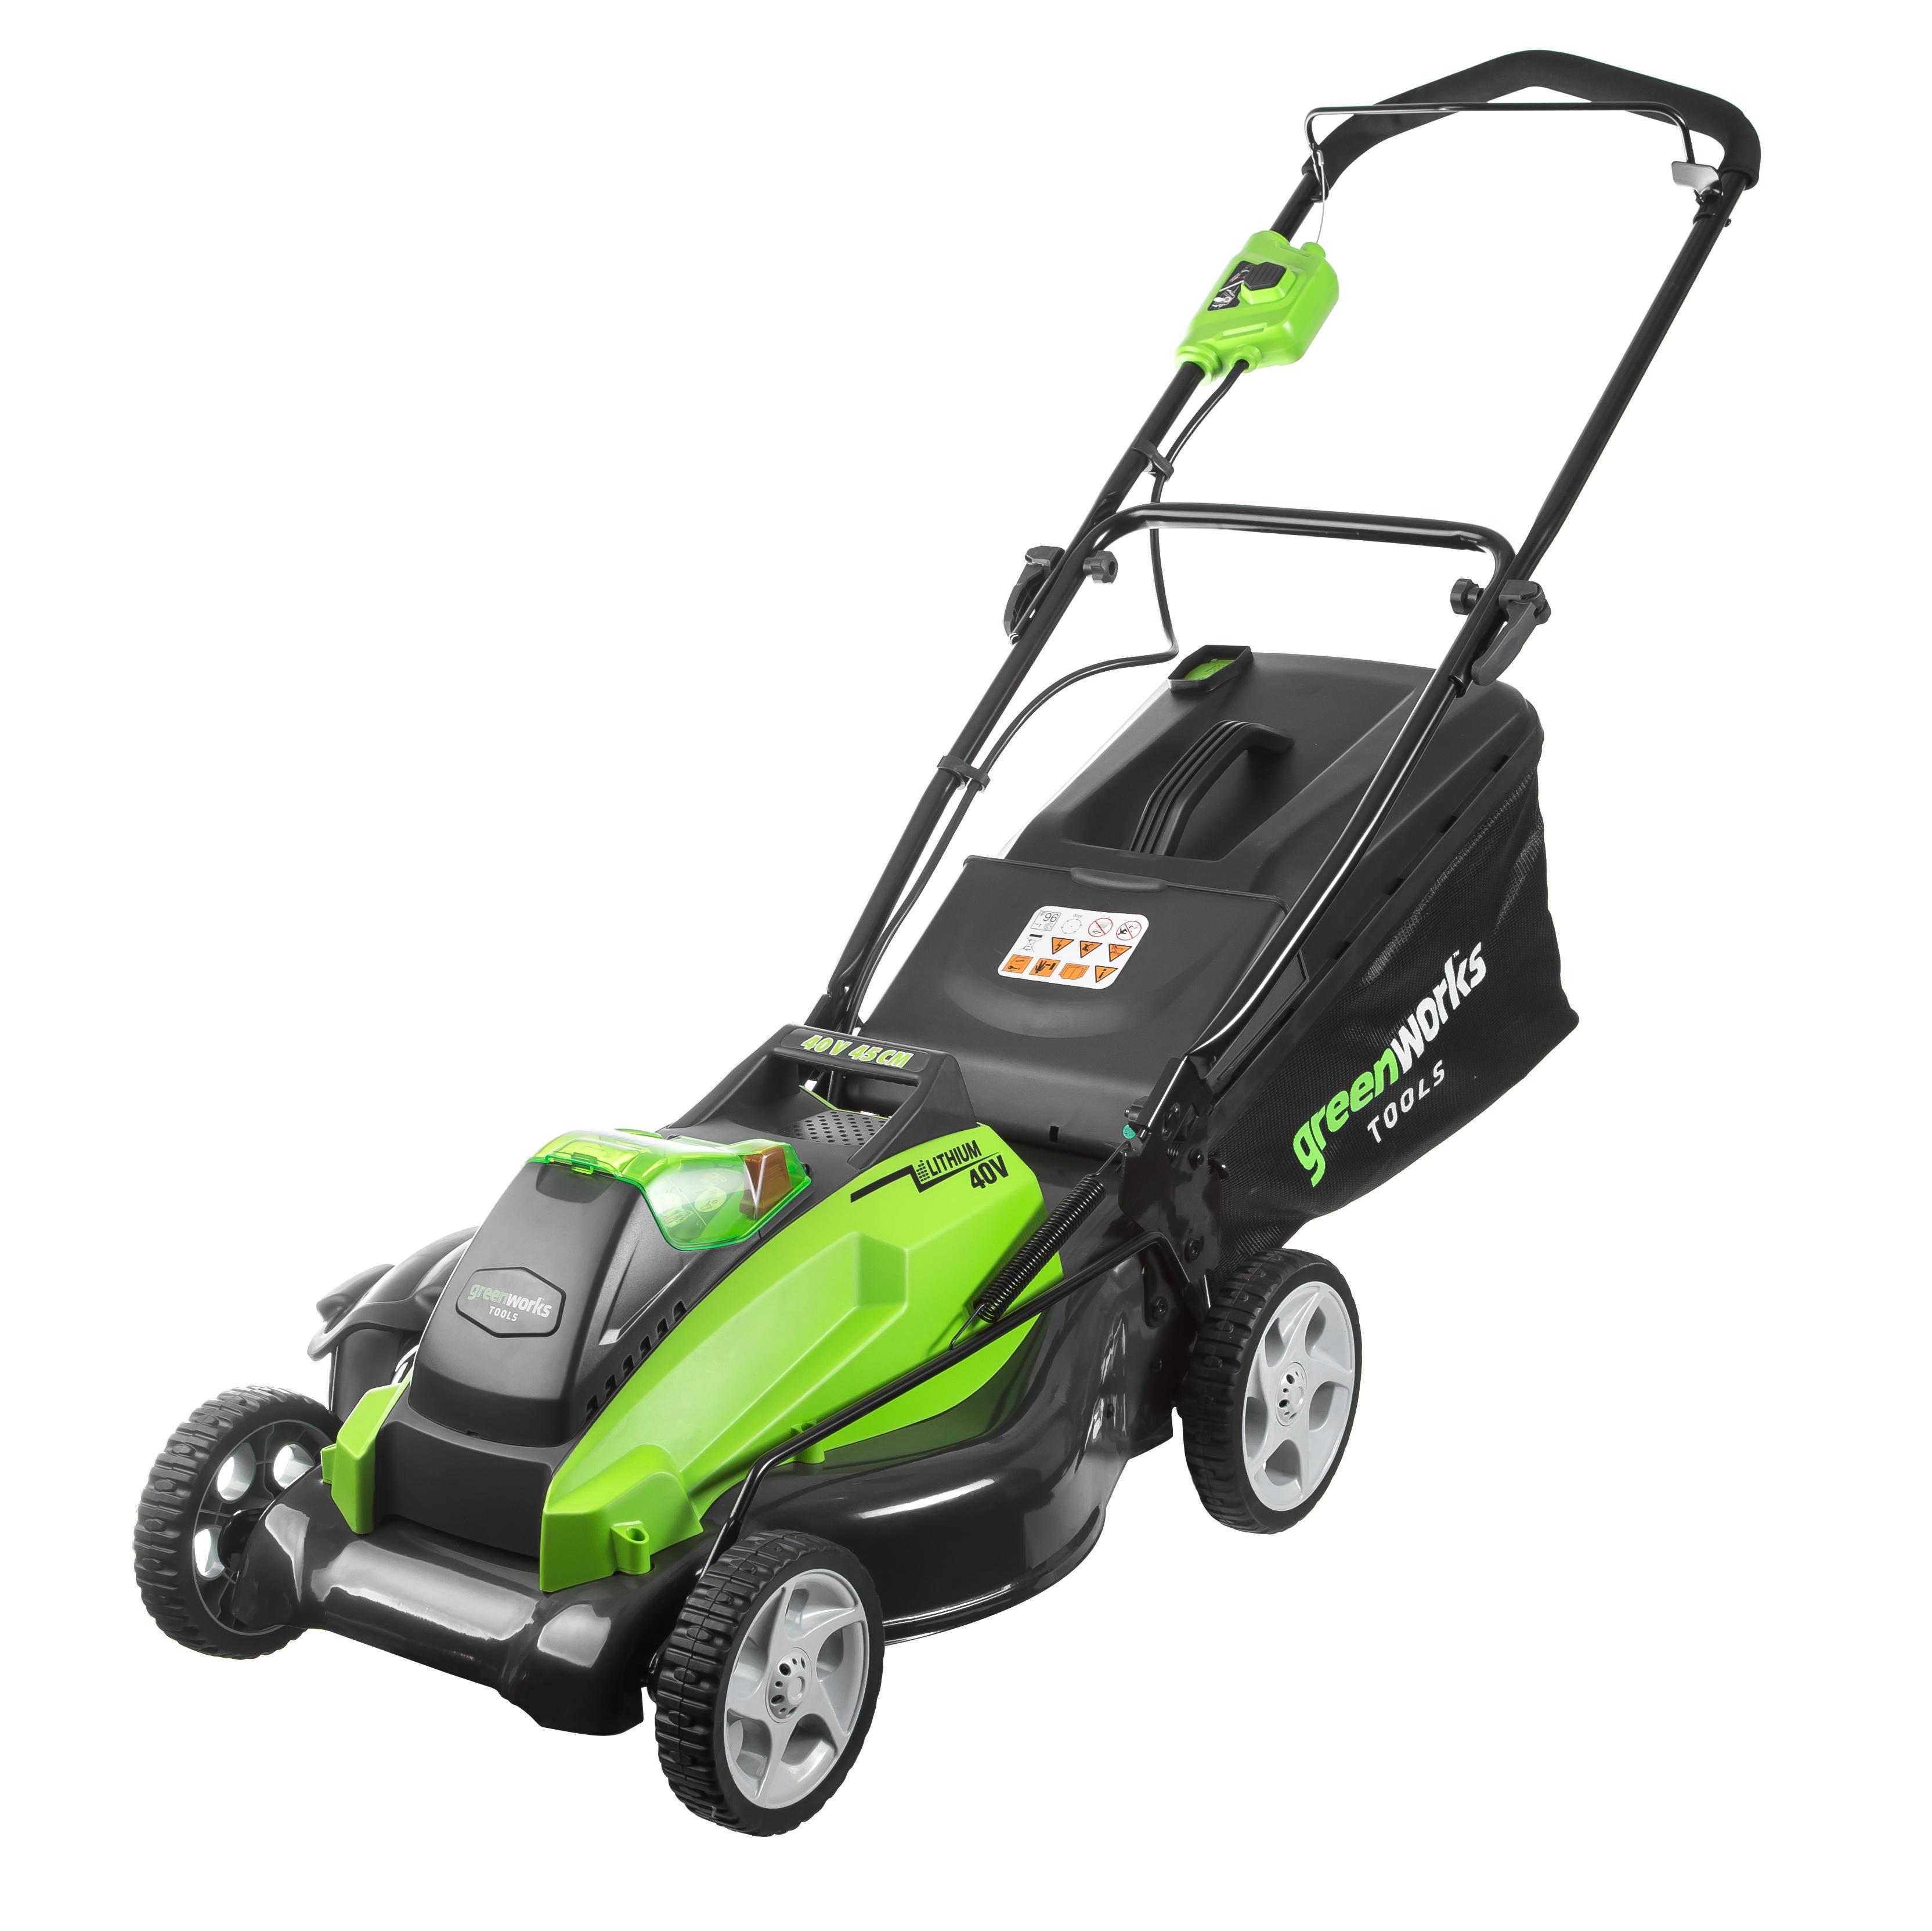 Аккумуляторная газонокосилка Greenworks G40lm45 (2500107) БЕЗ АККУМ и ЗУ